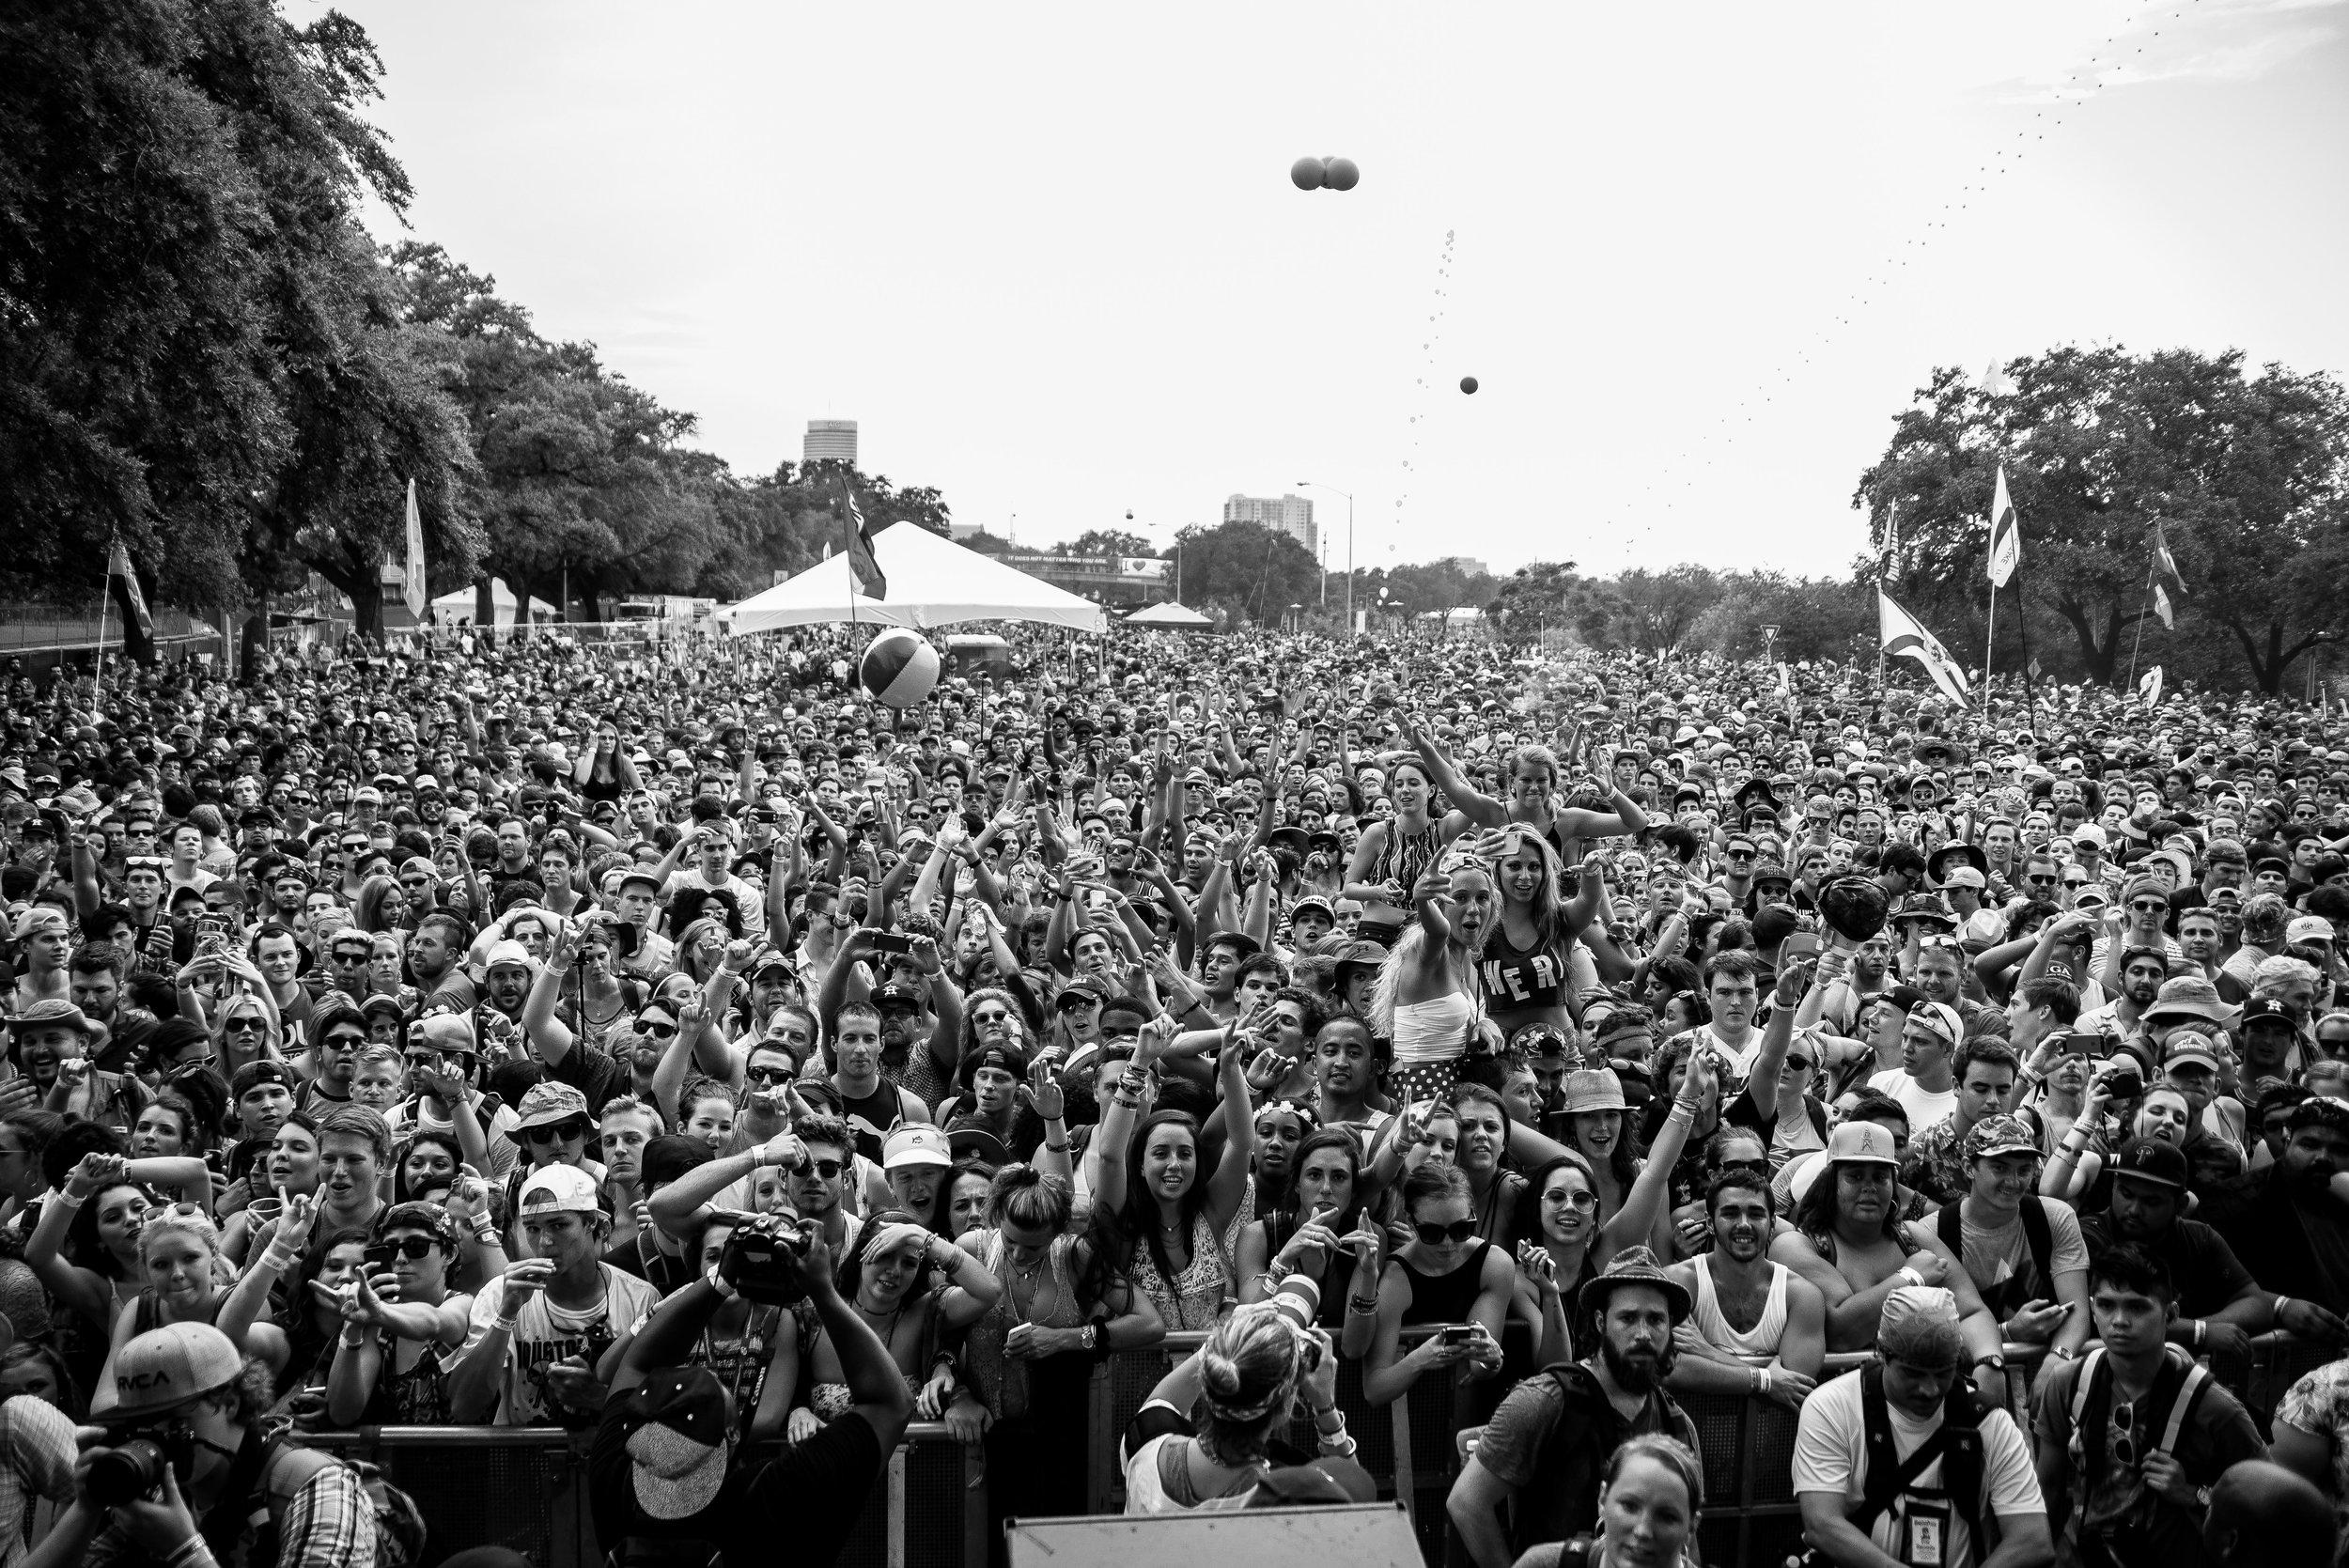 Fans at Free Press Summerfest